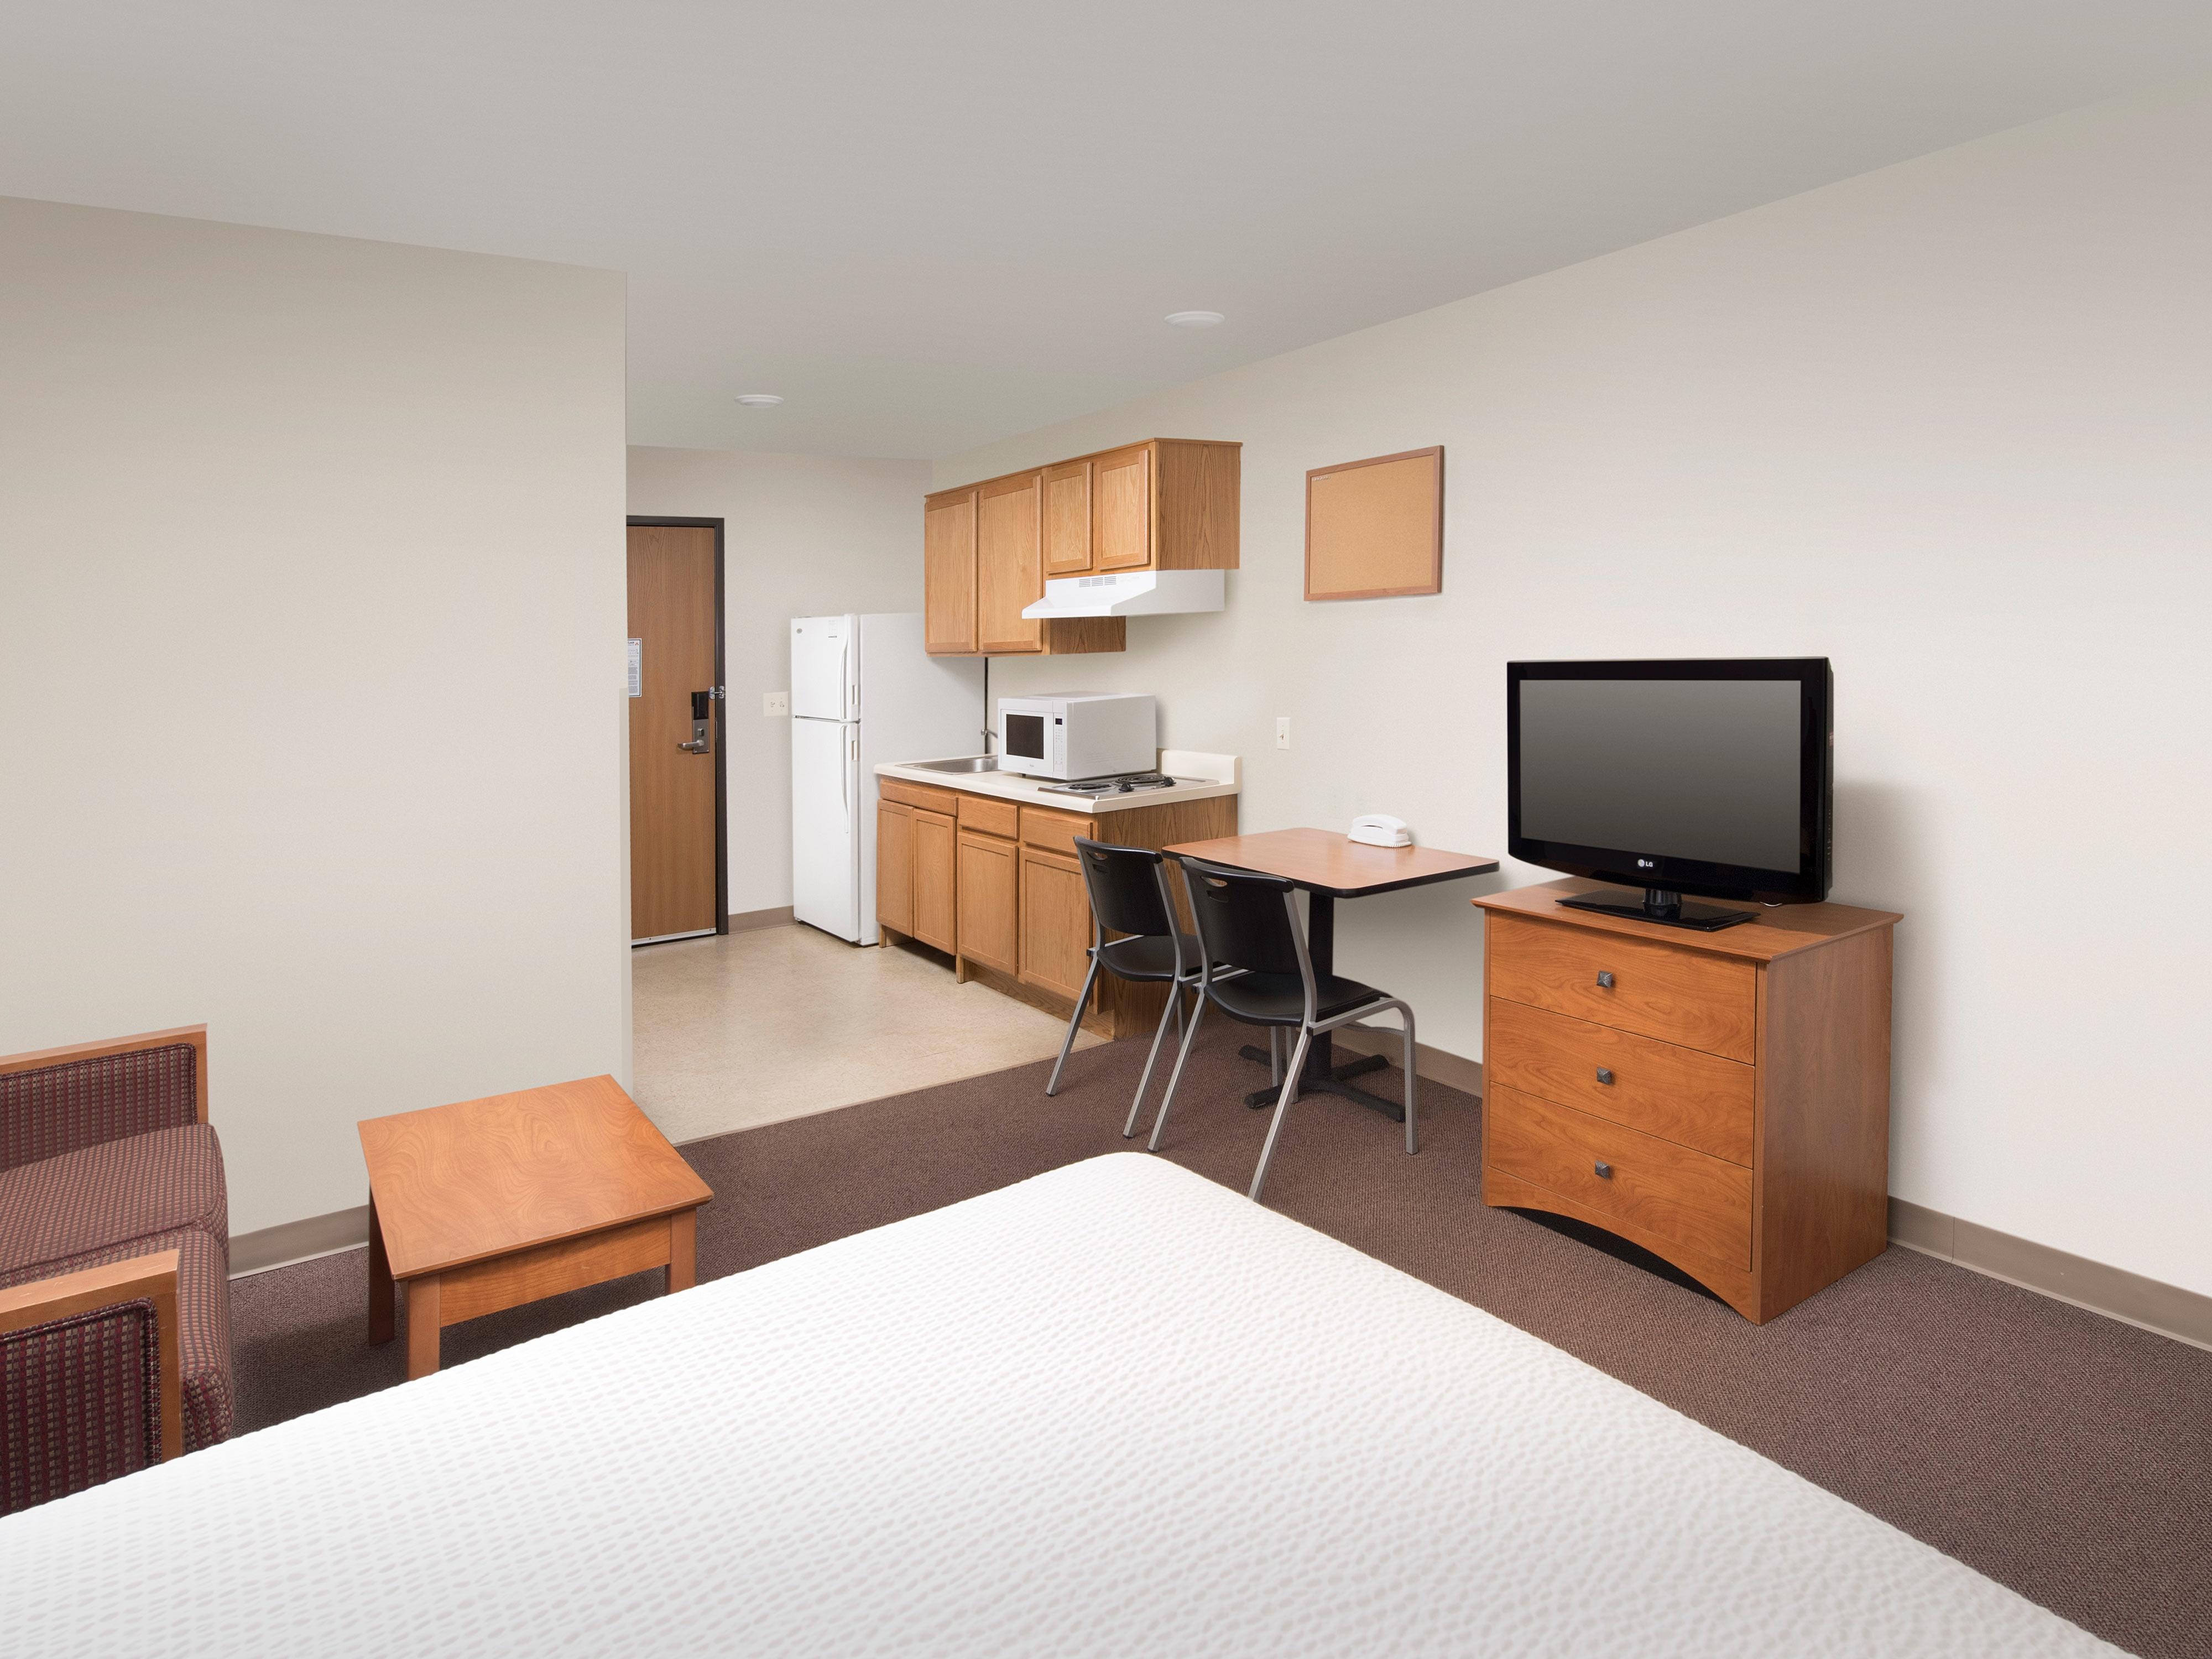 WoodSpring Suites Pensacola Northeast image 2